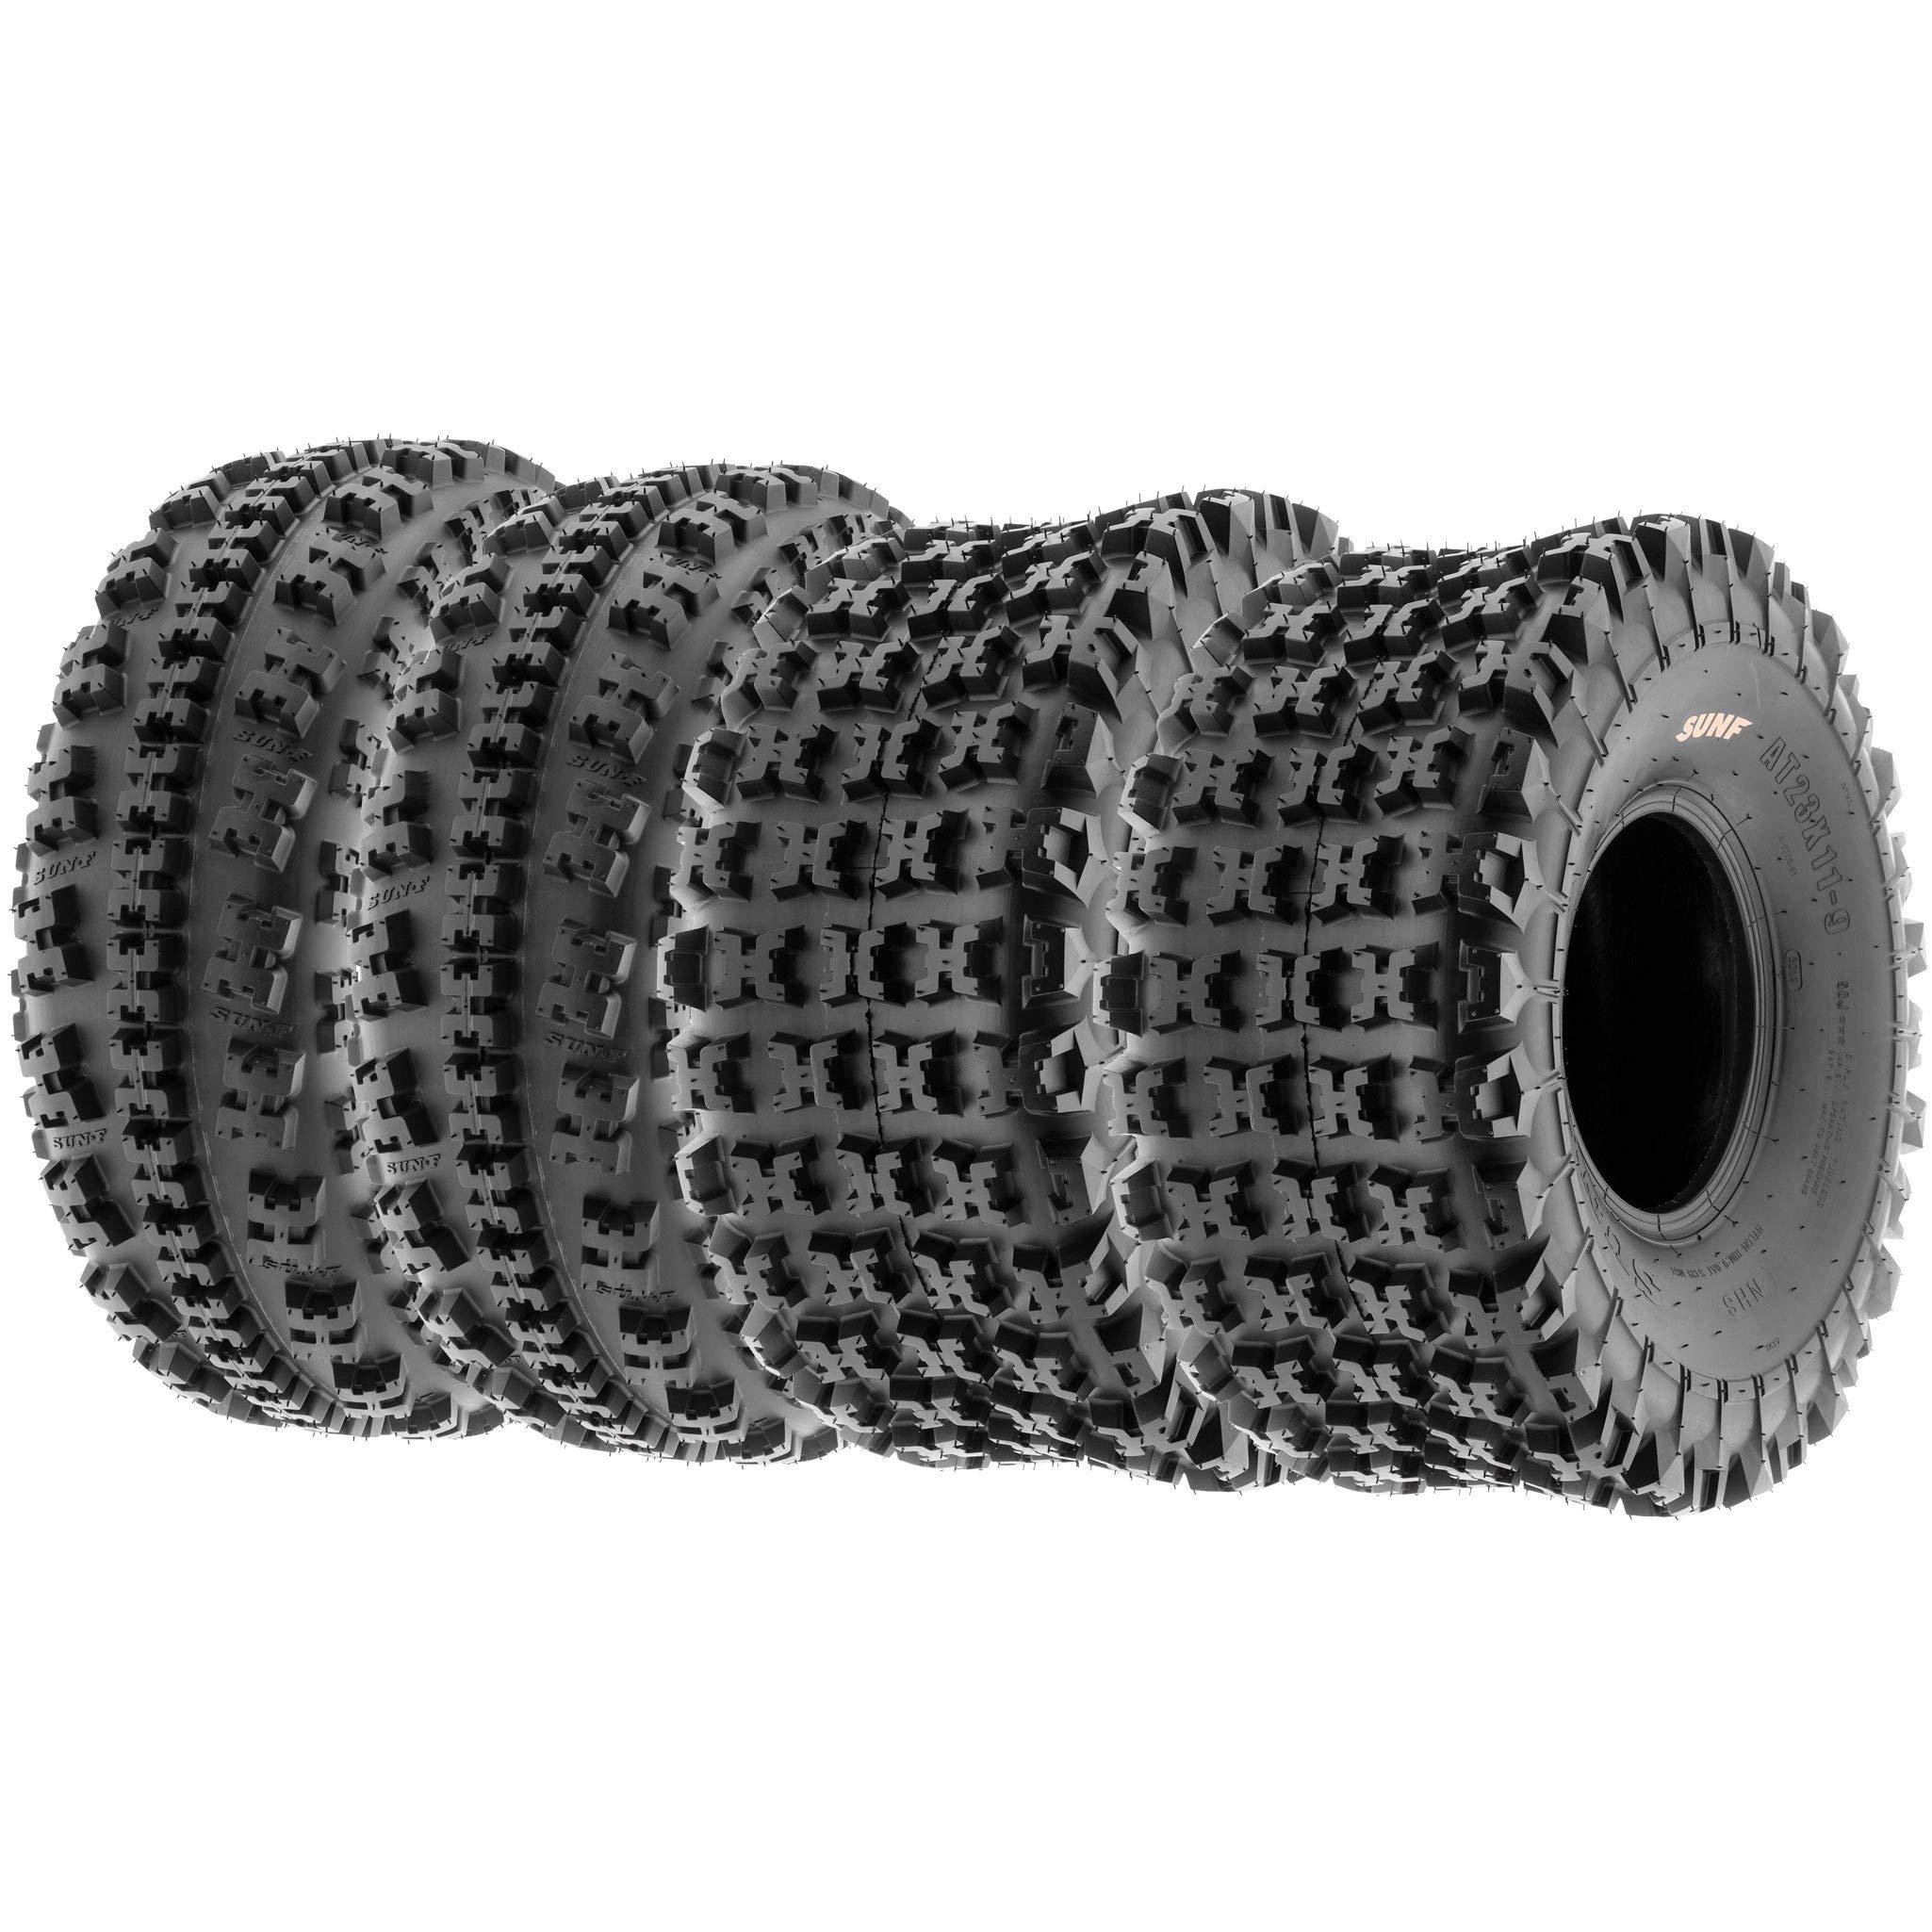 Set of 4 SunF A027 XC 19x7-8 Front & 20x10-10 Rear ATV UTV Knobby Sport Tires, 6 PR, Tubeless